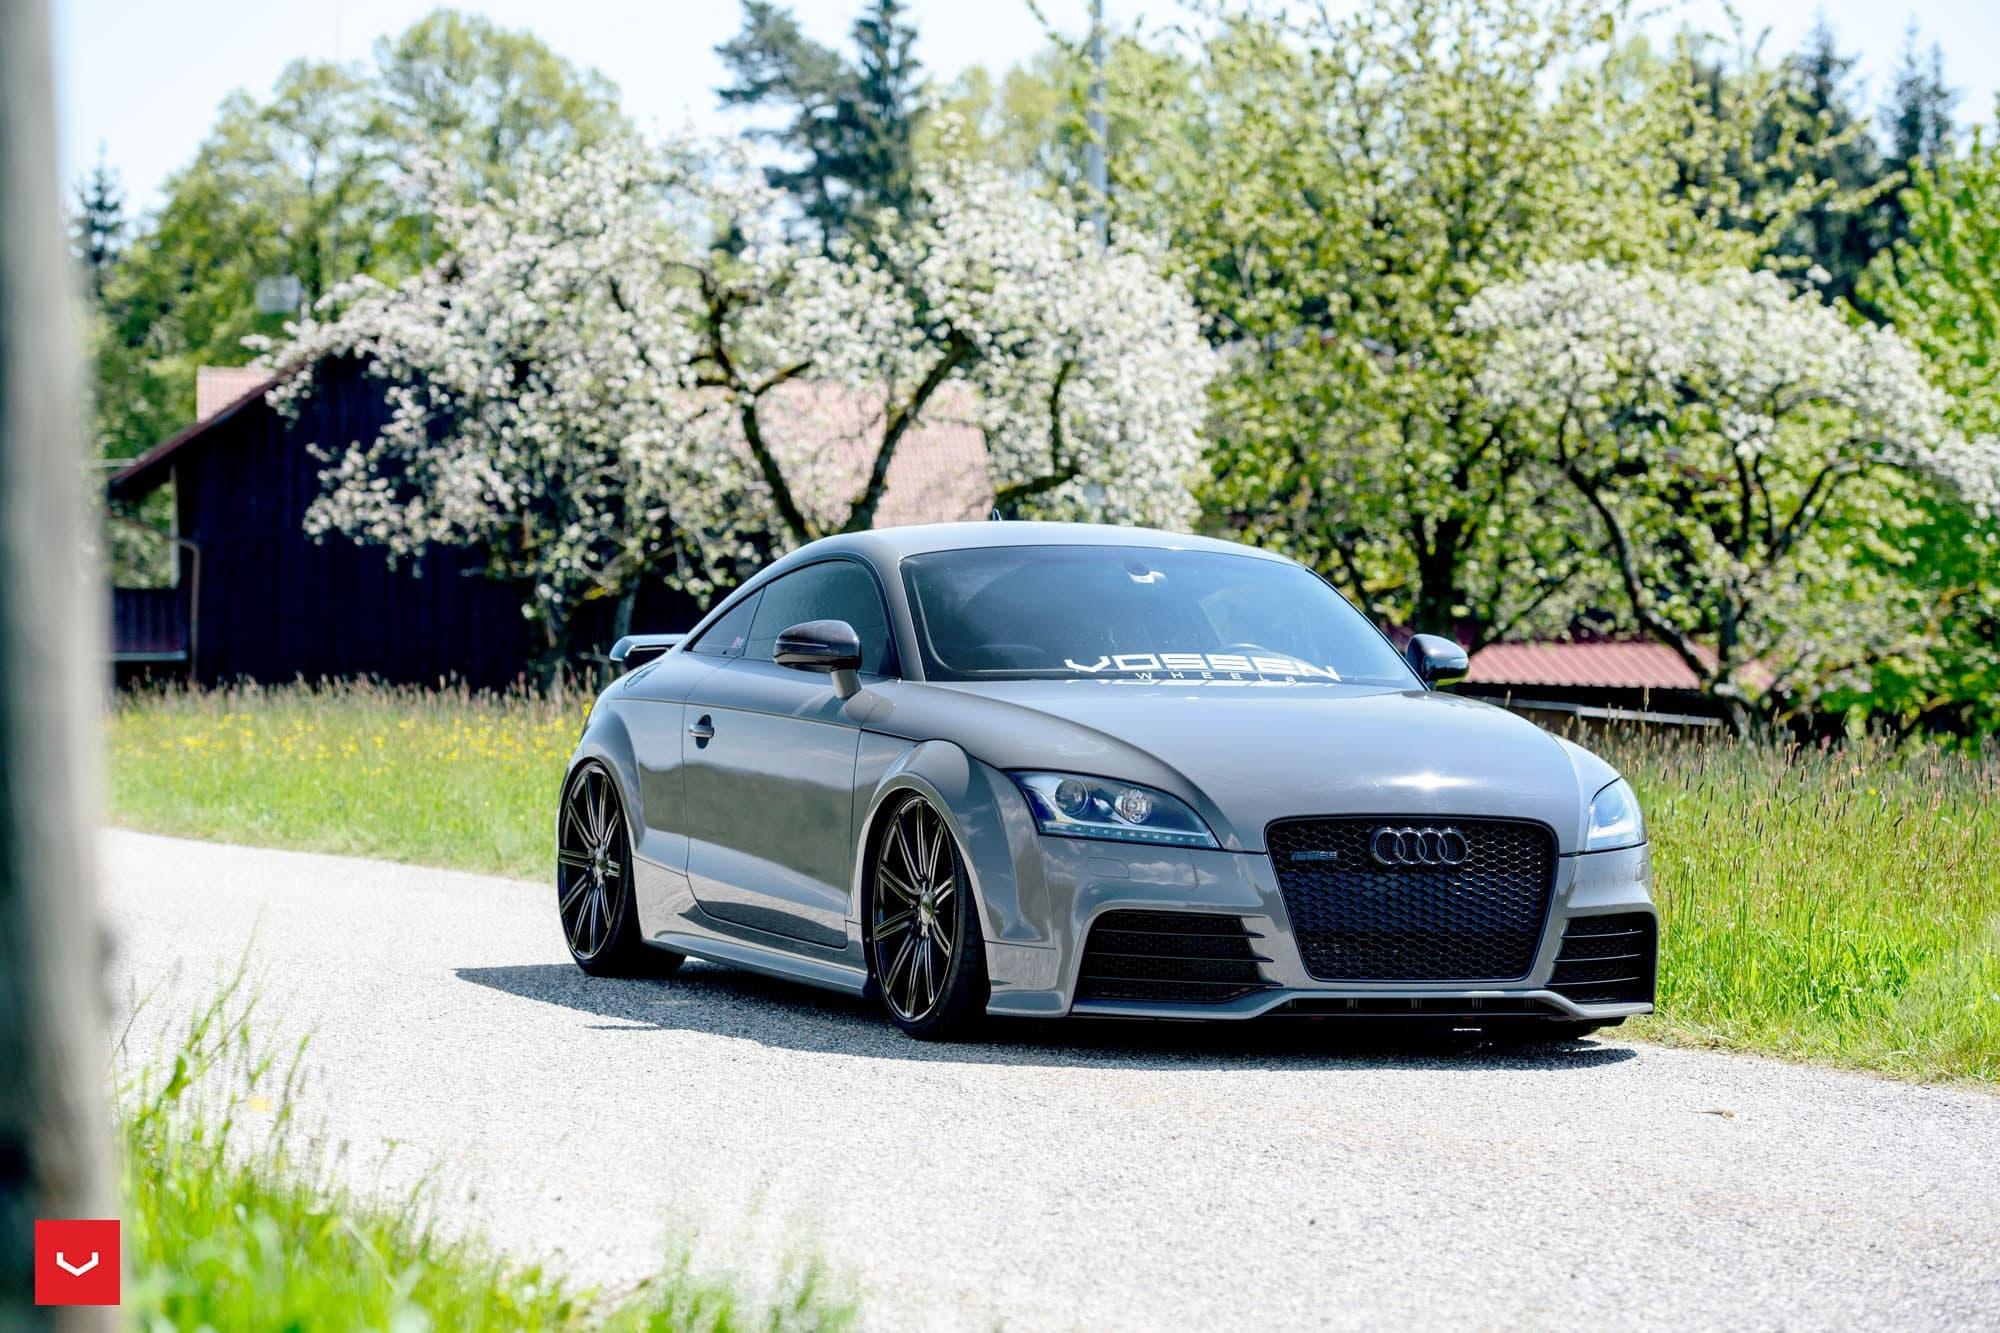 Audi TT RS Tuning Wallpapers HD Sport Vossen Wheels 2000x1333